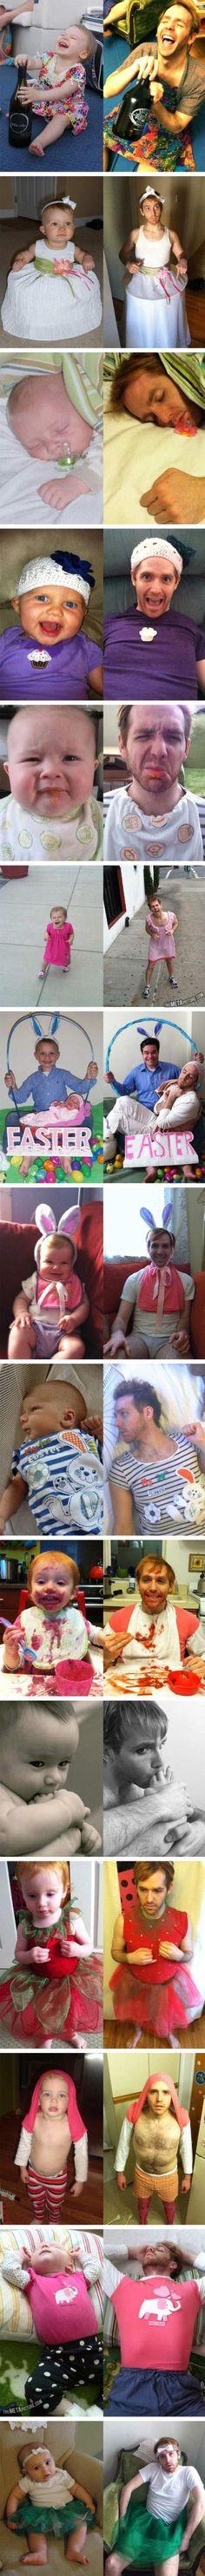 Baby pictures reenacted…